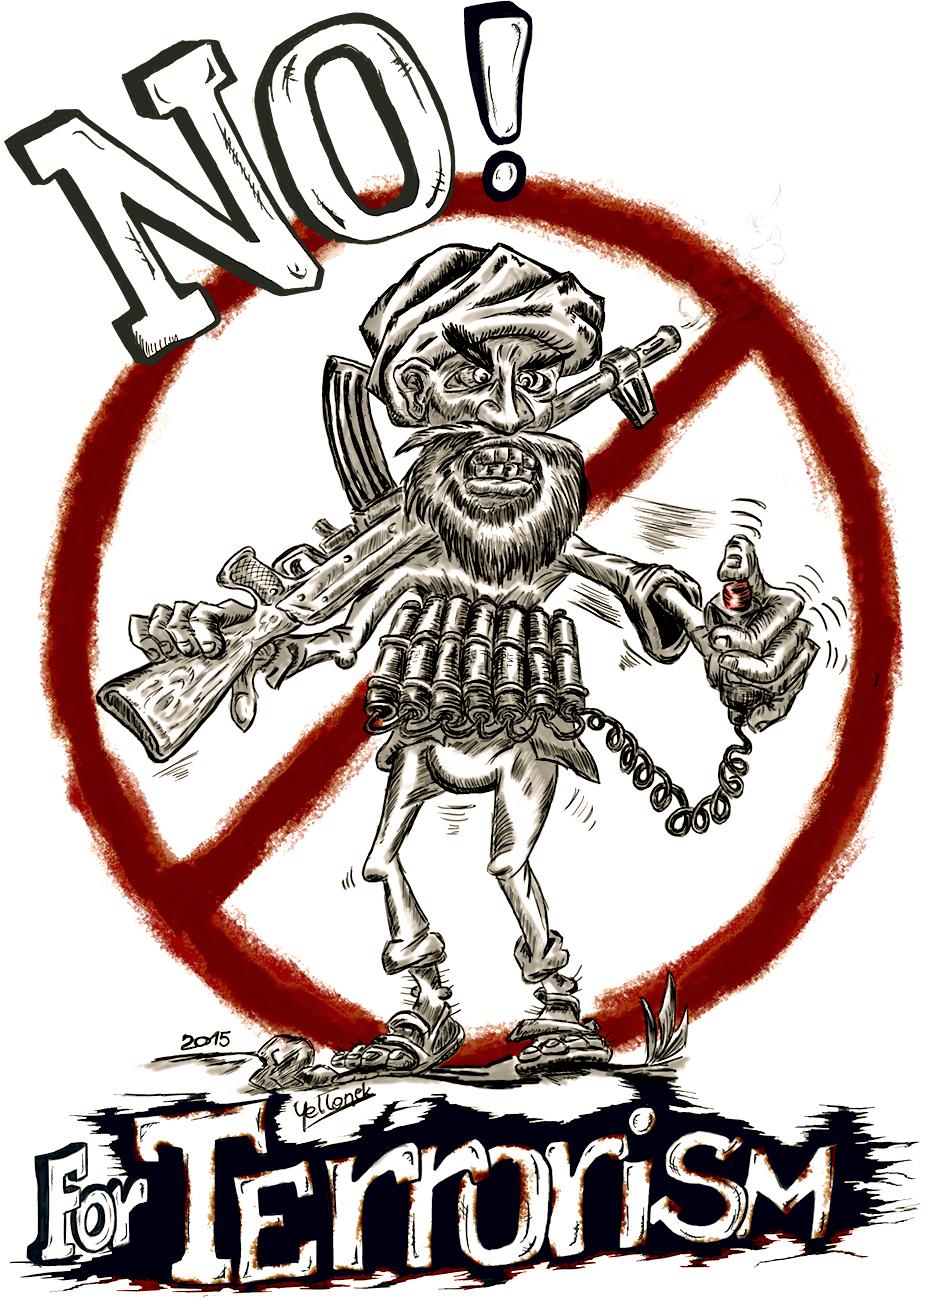 No Terrorism poster by Willhorn on DeviantArt  No Terrorism